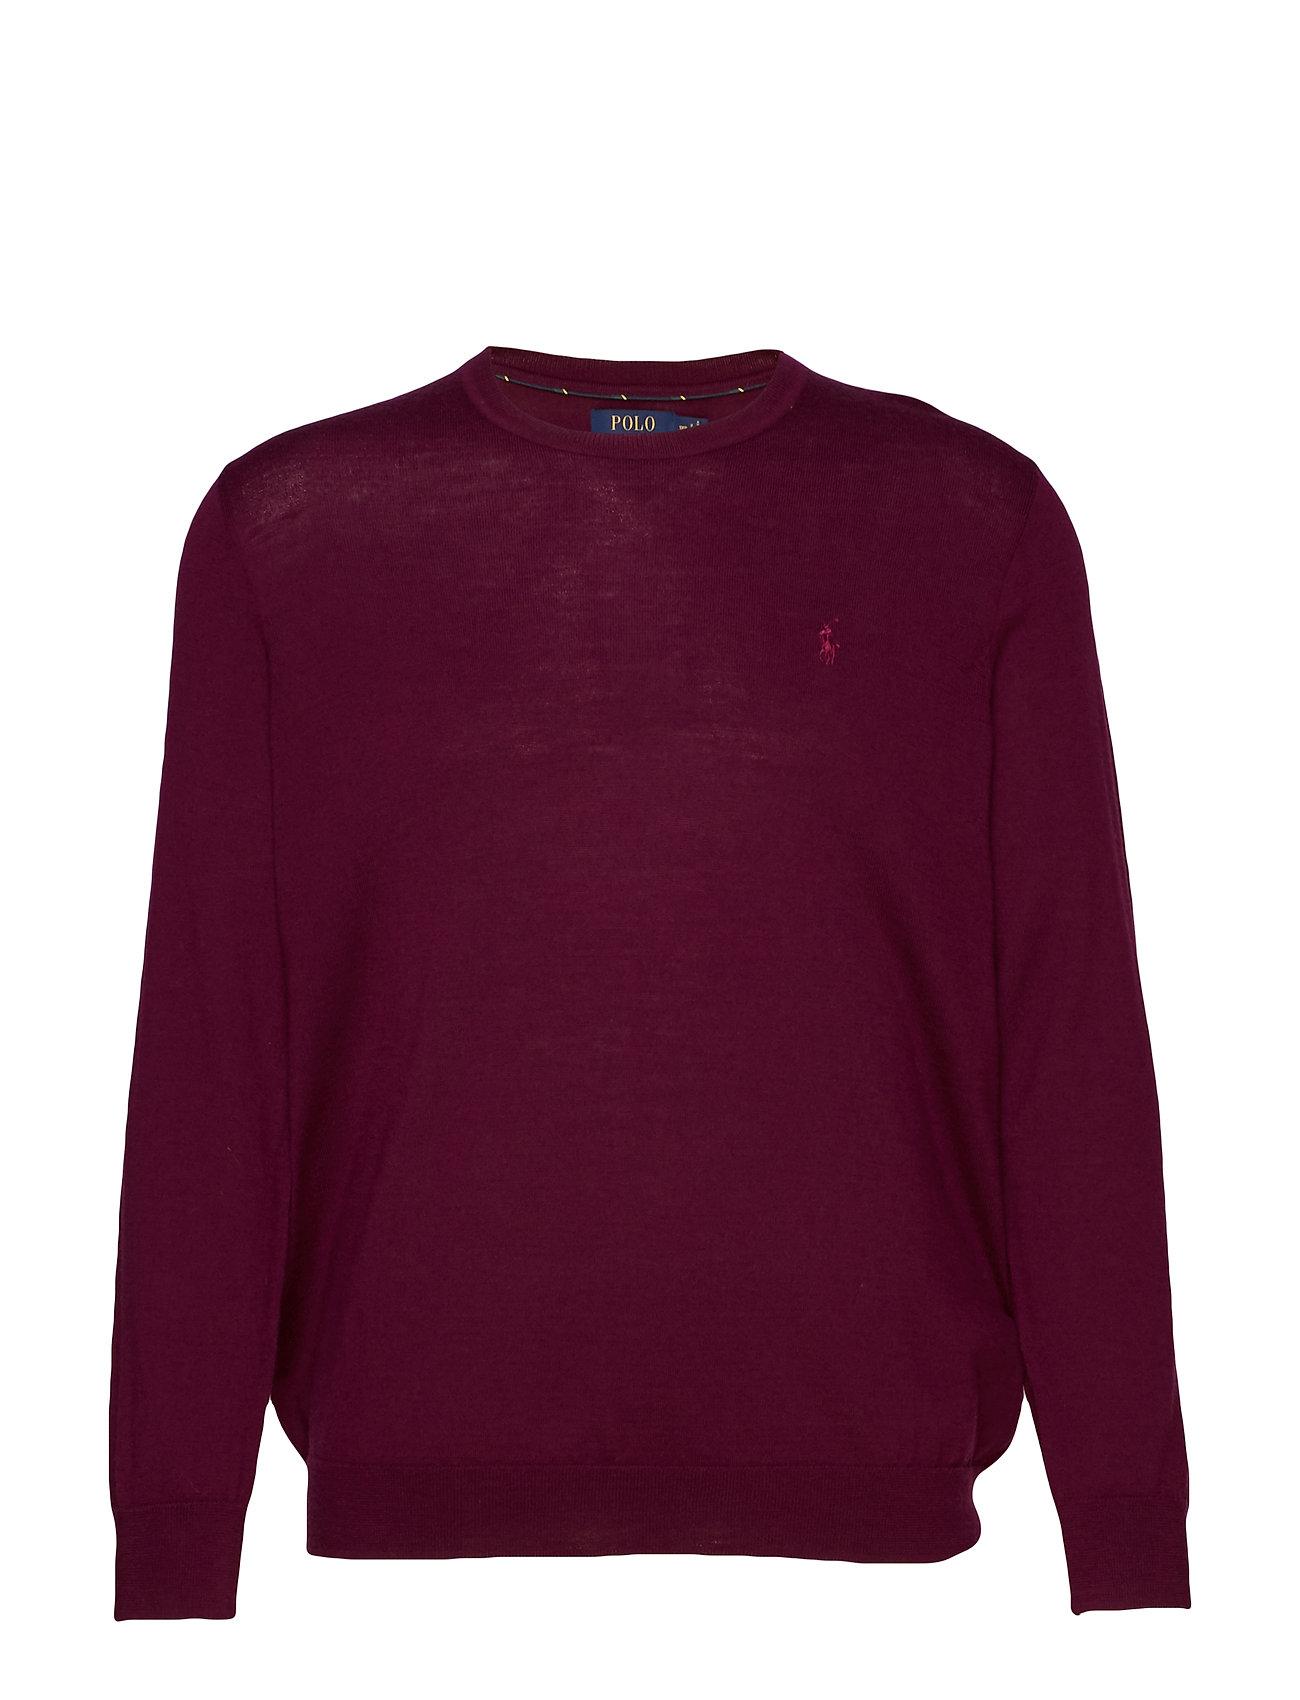 Polo Ralph Lauren Big & Tall Washable Merino Wool Sweater - CLASSIC BURGUNDY